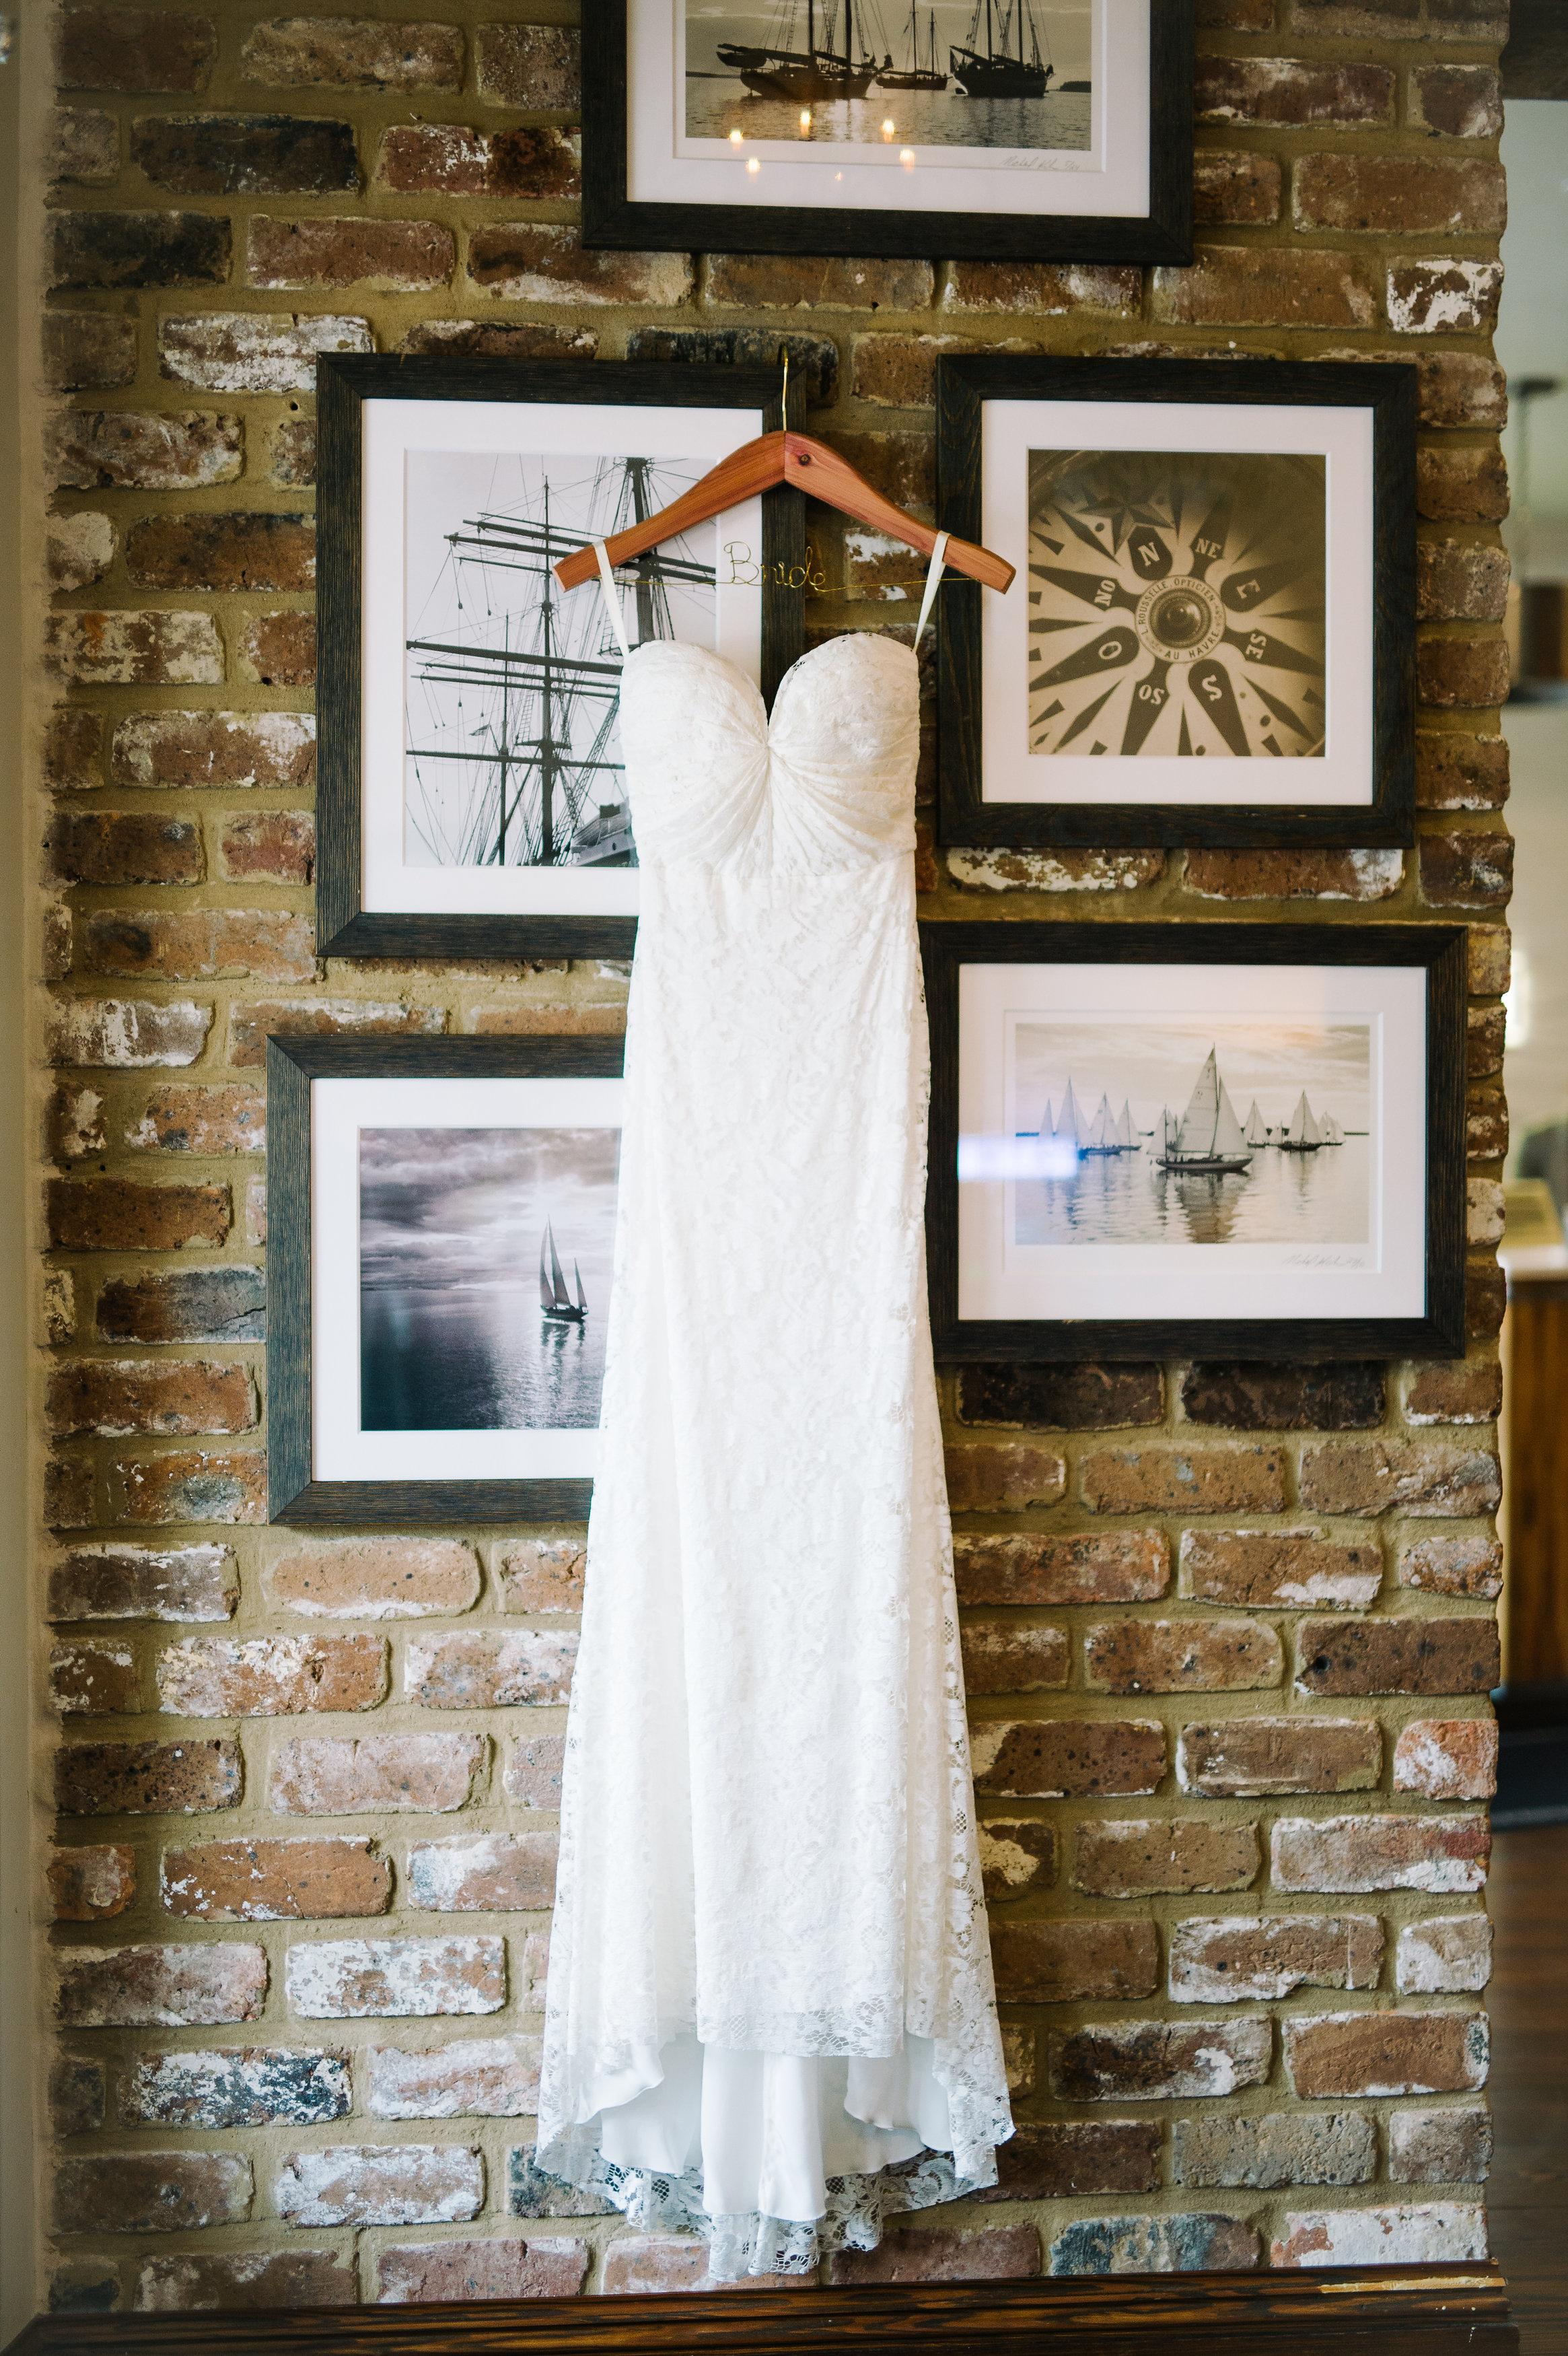 amber-and-paul-rach-loves-troy-charles-h-morris-center-wedding-sarah-seven-helene-lace-wedding-dress-ivory-and-beau-bridal-boutique-savannah-wedding-planner-savannah-event-designer-savannah-florist-savannah-weddings-savannah-bridal-boutique-1.jpg